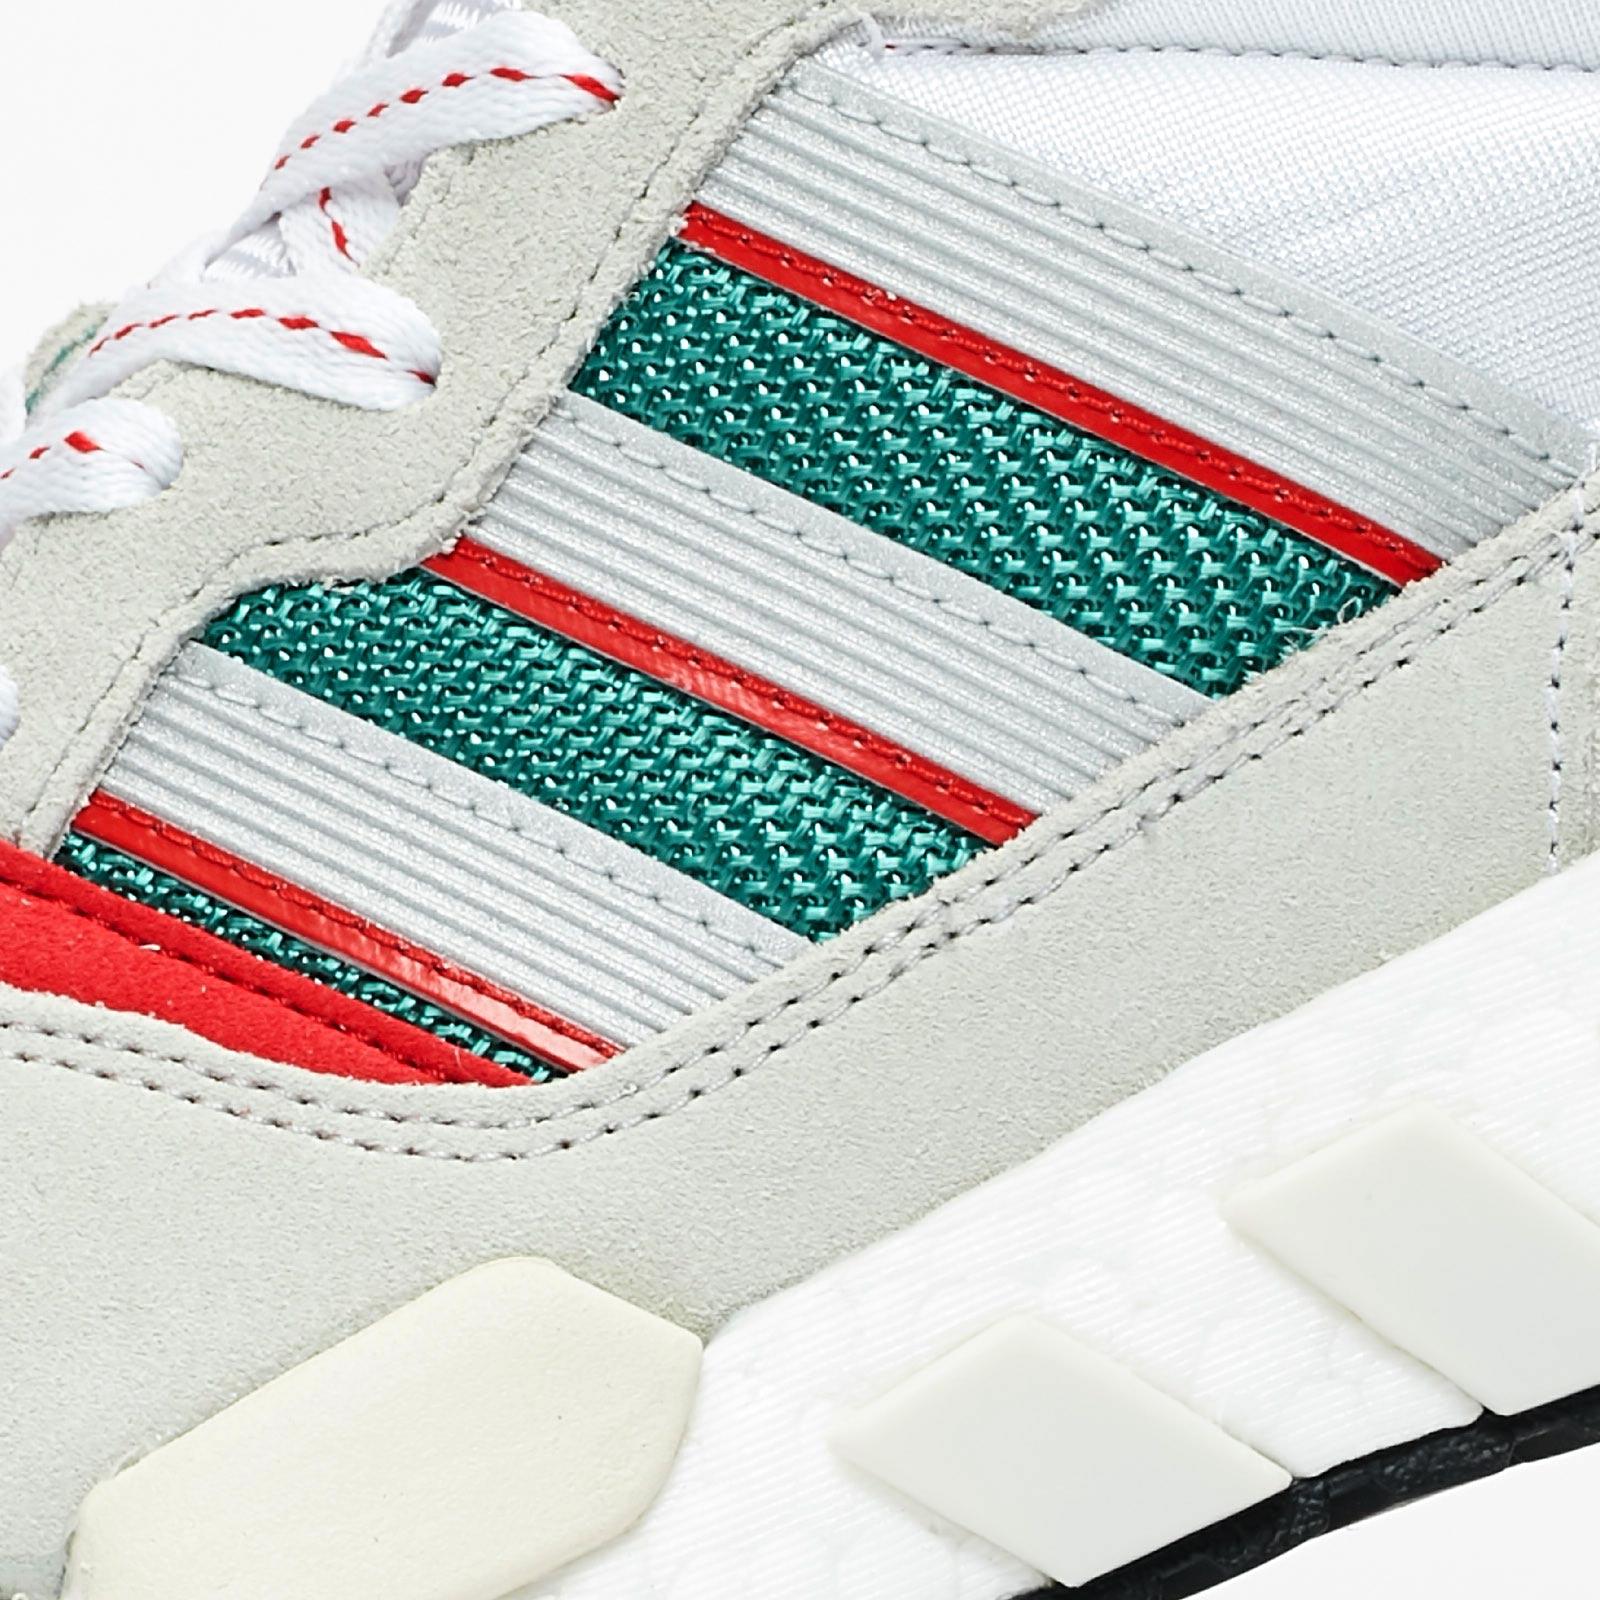 hot sale online 962be 0b469 adidas ZX930 x EQT - G26806 - Sneakersnstuff | sneakers ...